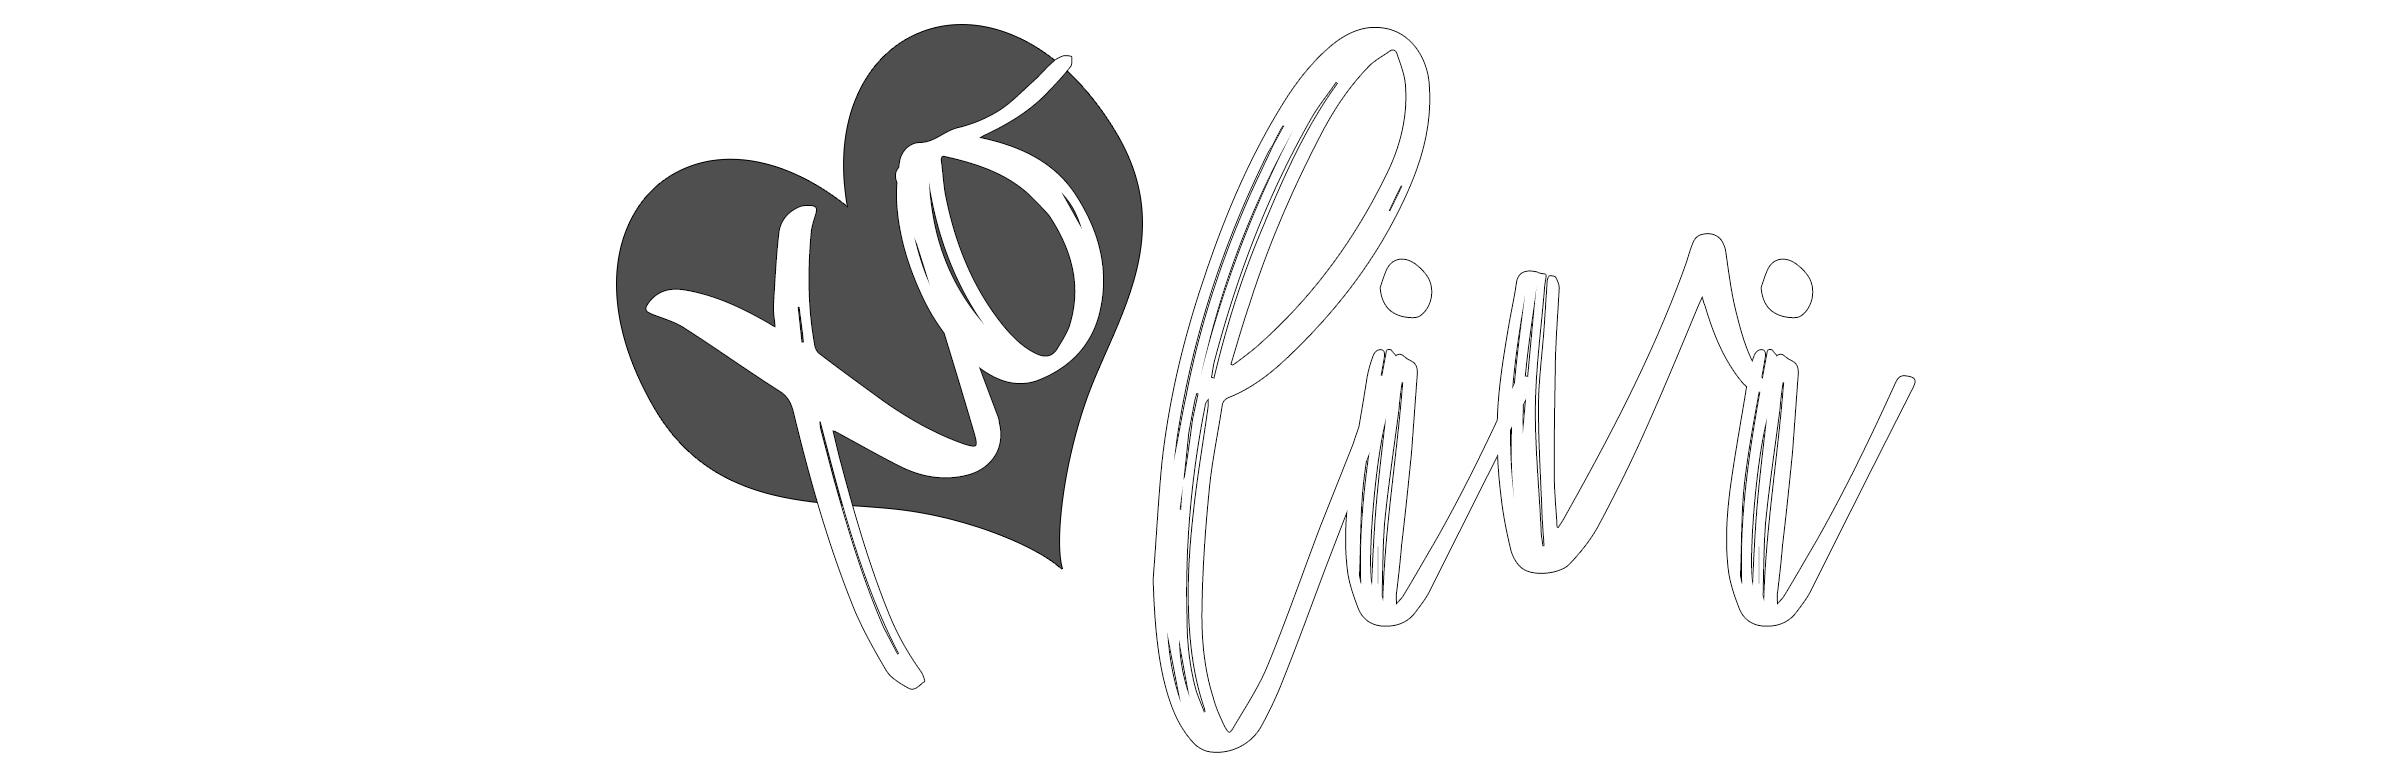 xolivi logo